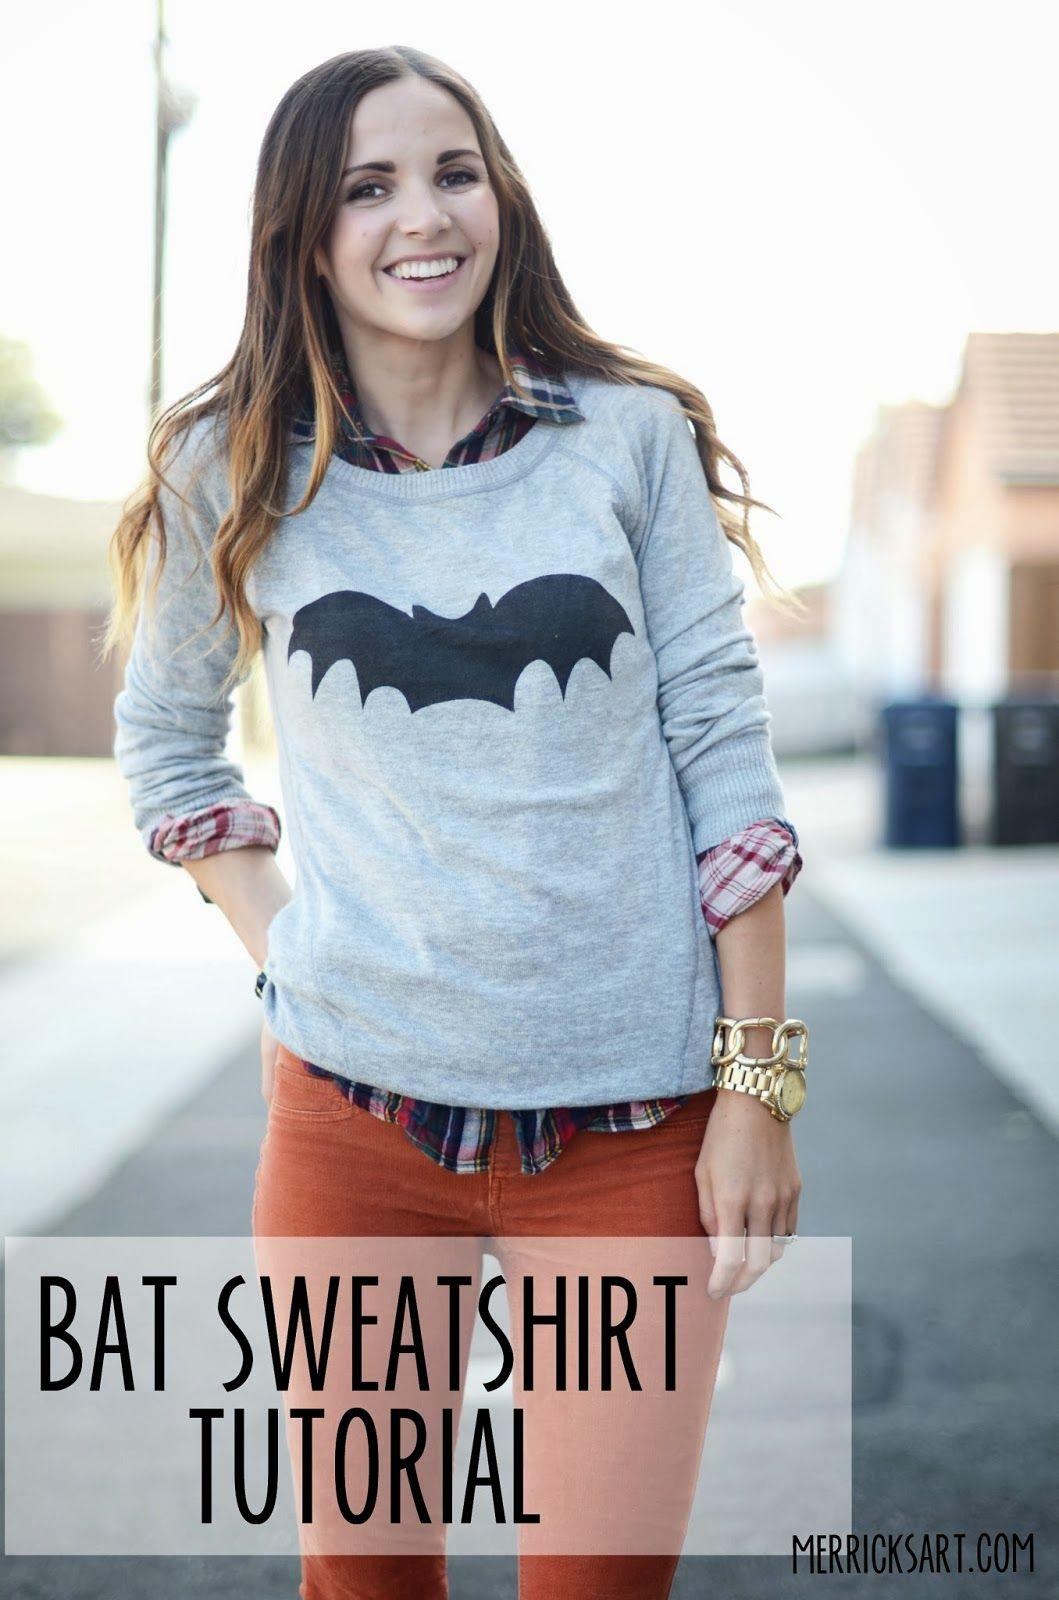 Bat sweatshirt tutorial using spray fabric paint - for Halloween or whenever ! - From Merrick's Art